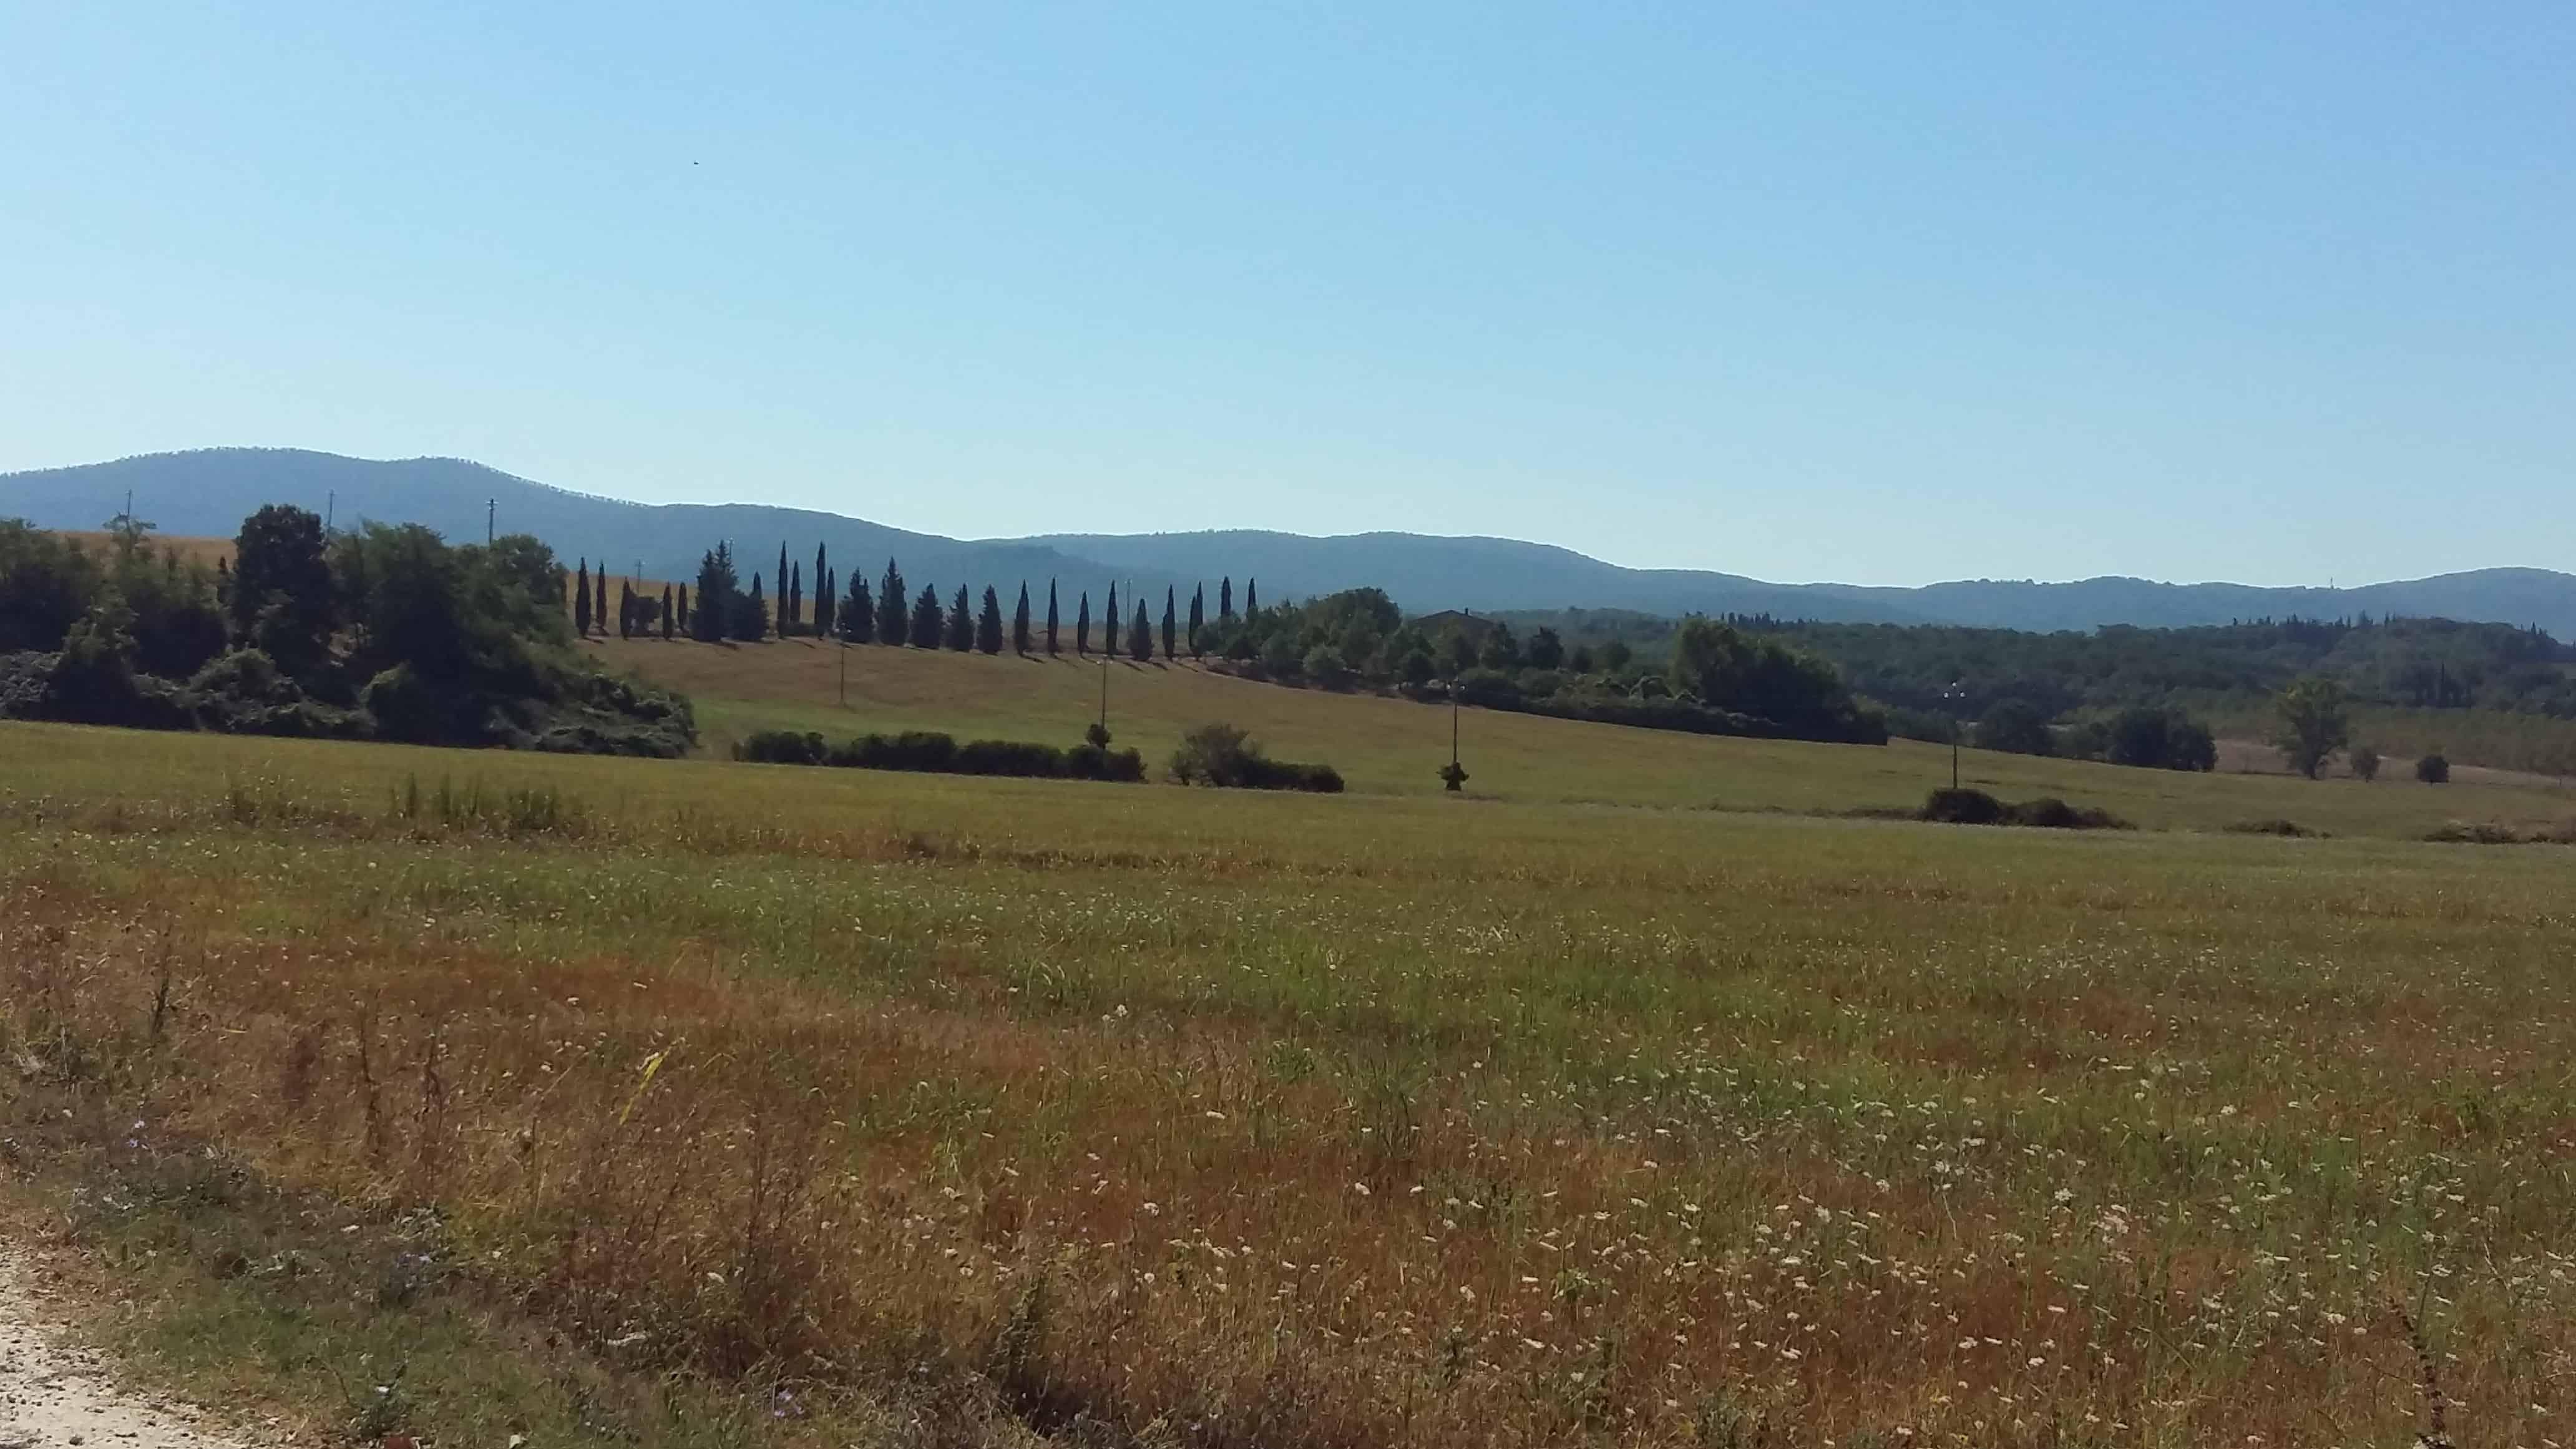 Via Francigena. Giorno 29 – da San Gimignano ad Abbadia Isola